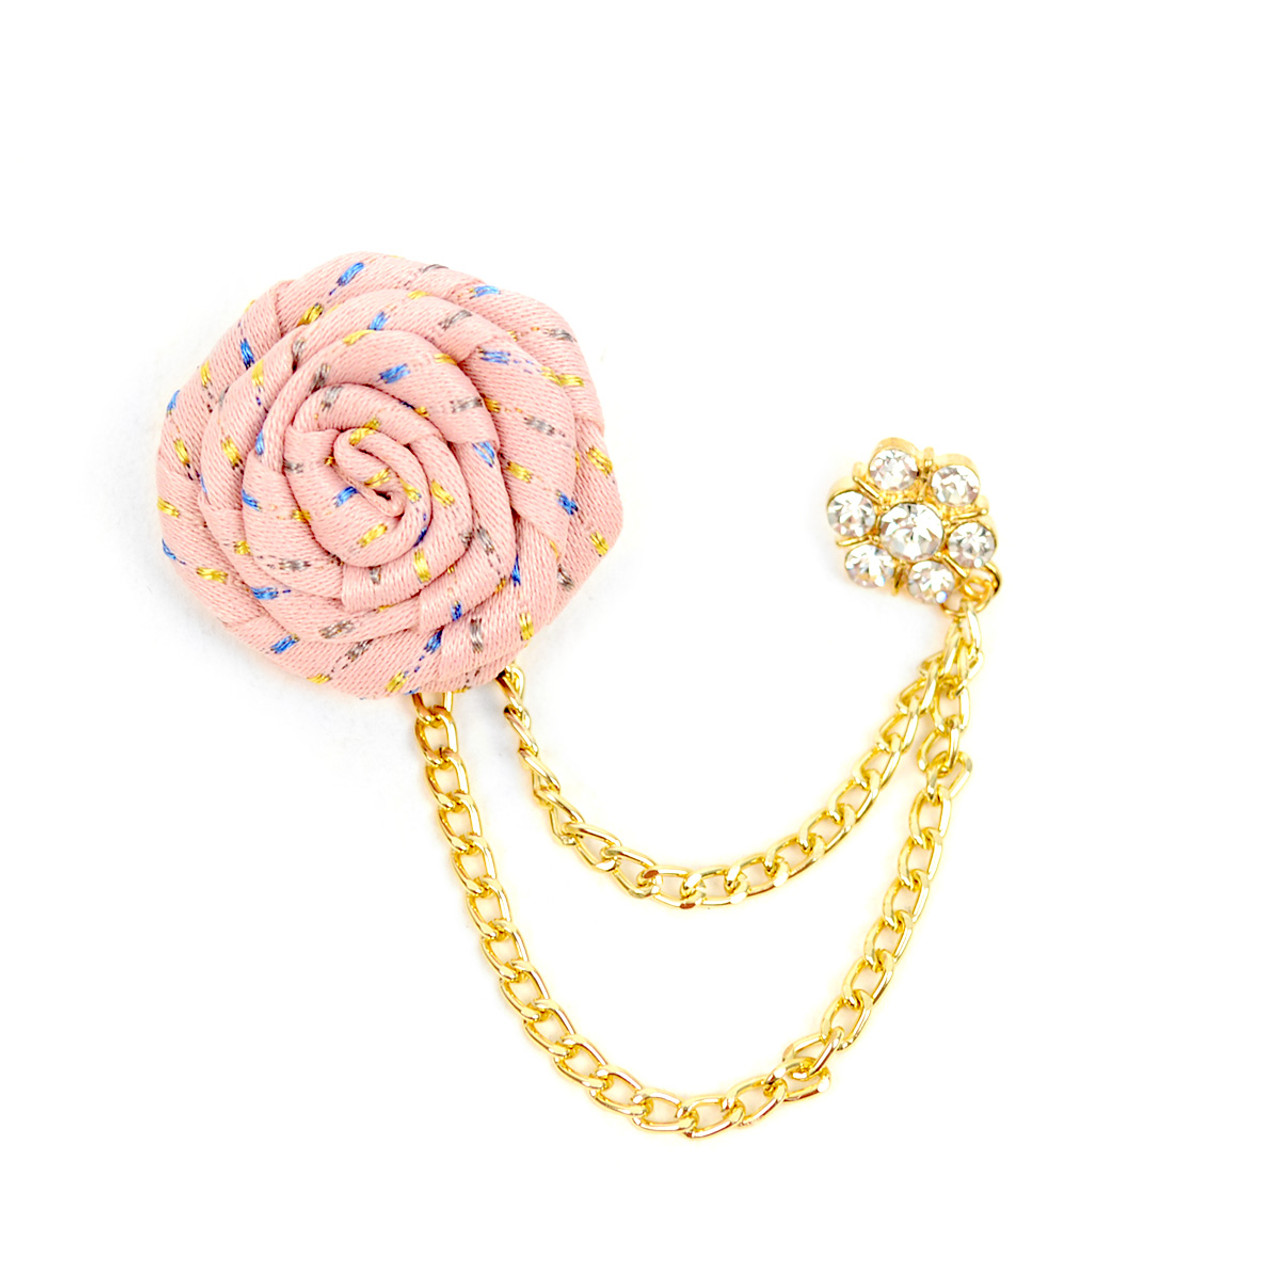 Men's Flower Boutonniere Clutch Back Lapel Pins with Chain - FLP1802